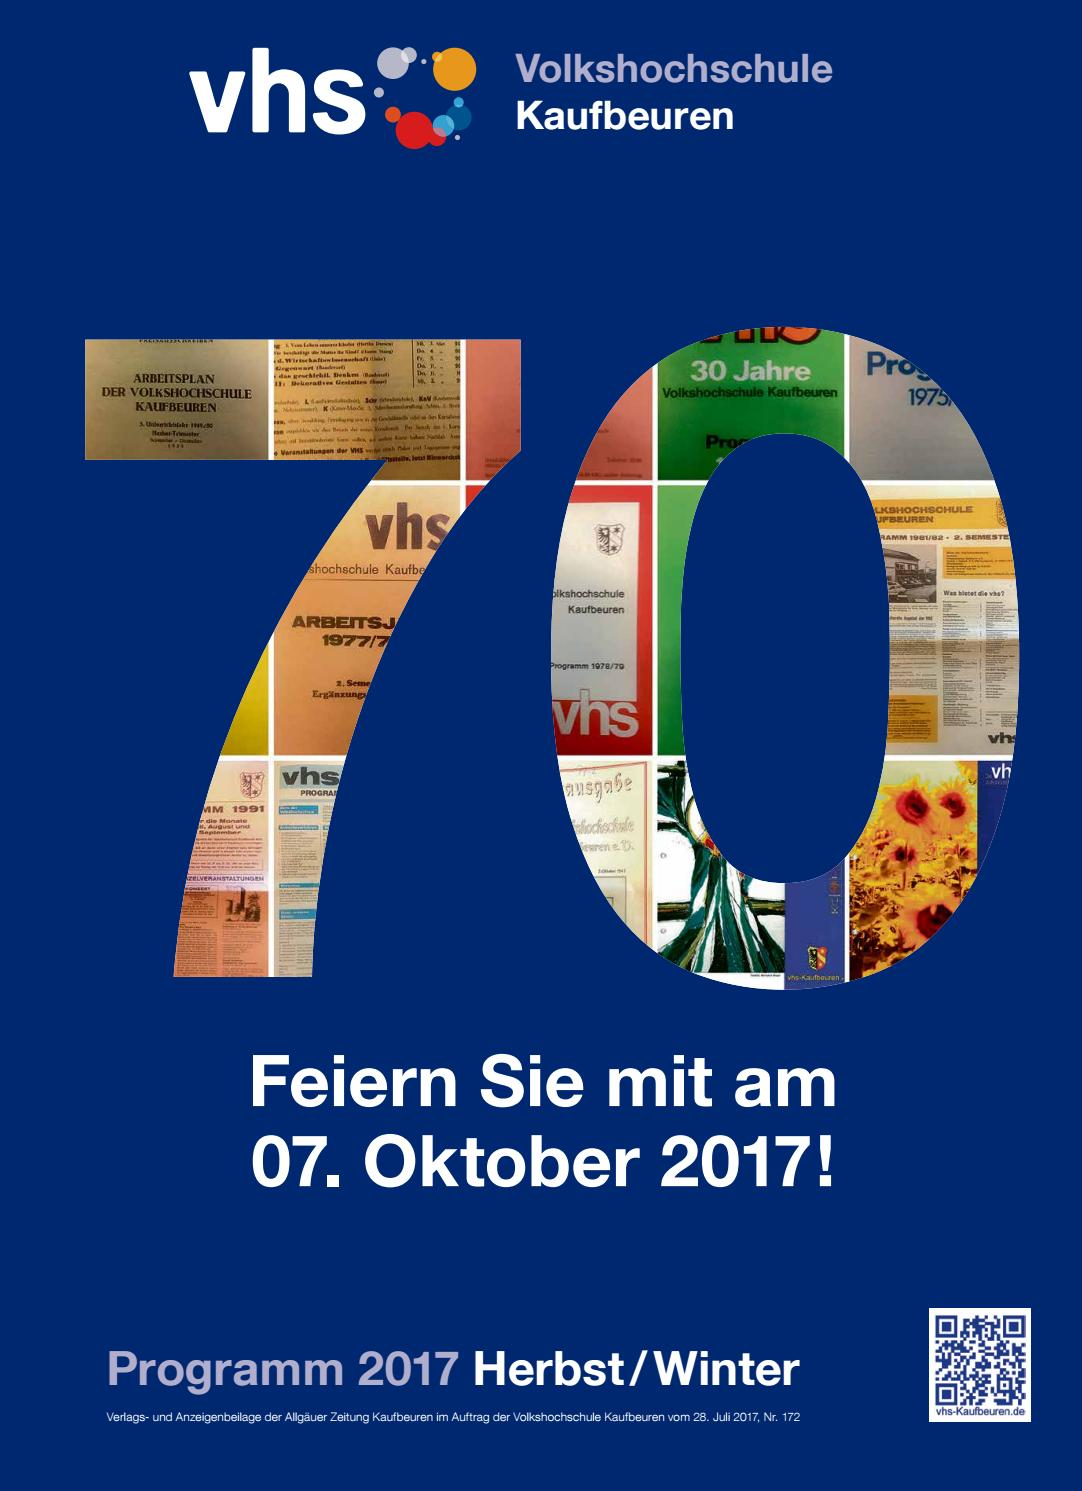 vhs Kaufbeuren Herbst Winter 2017 Programm by Volkshochschule ...